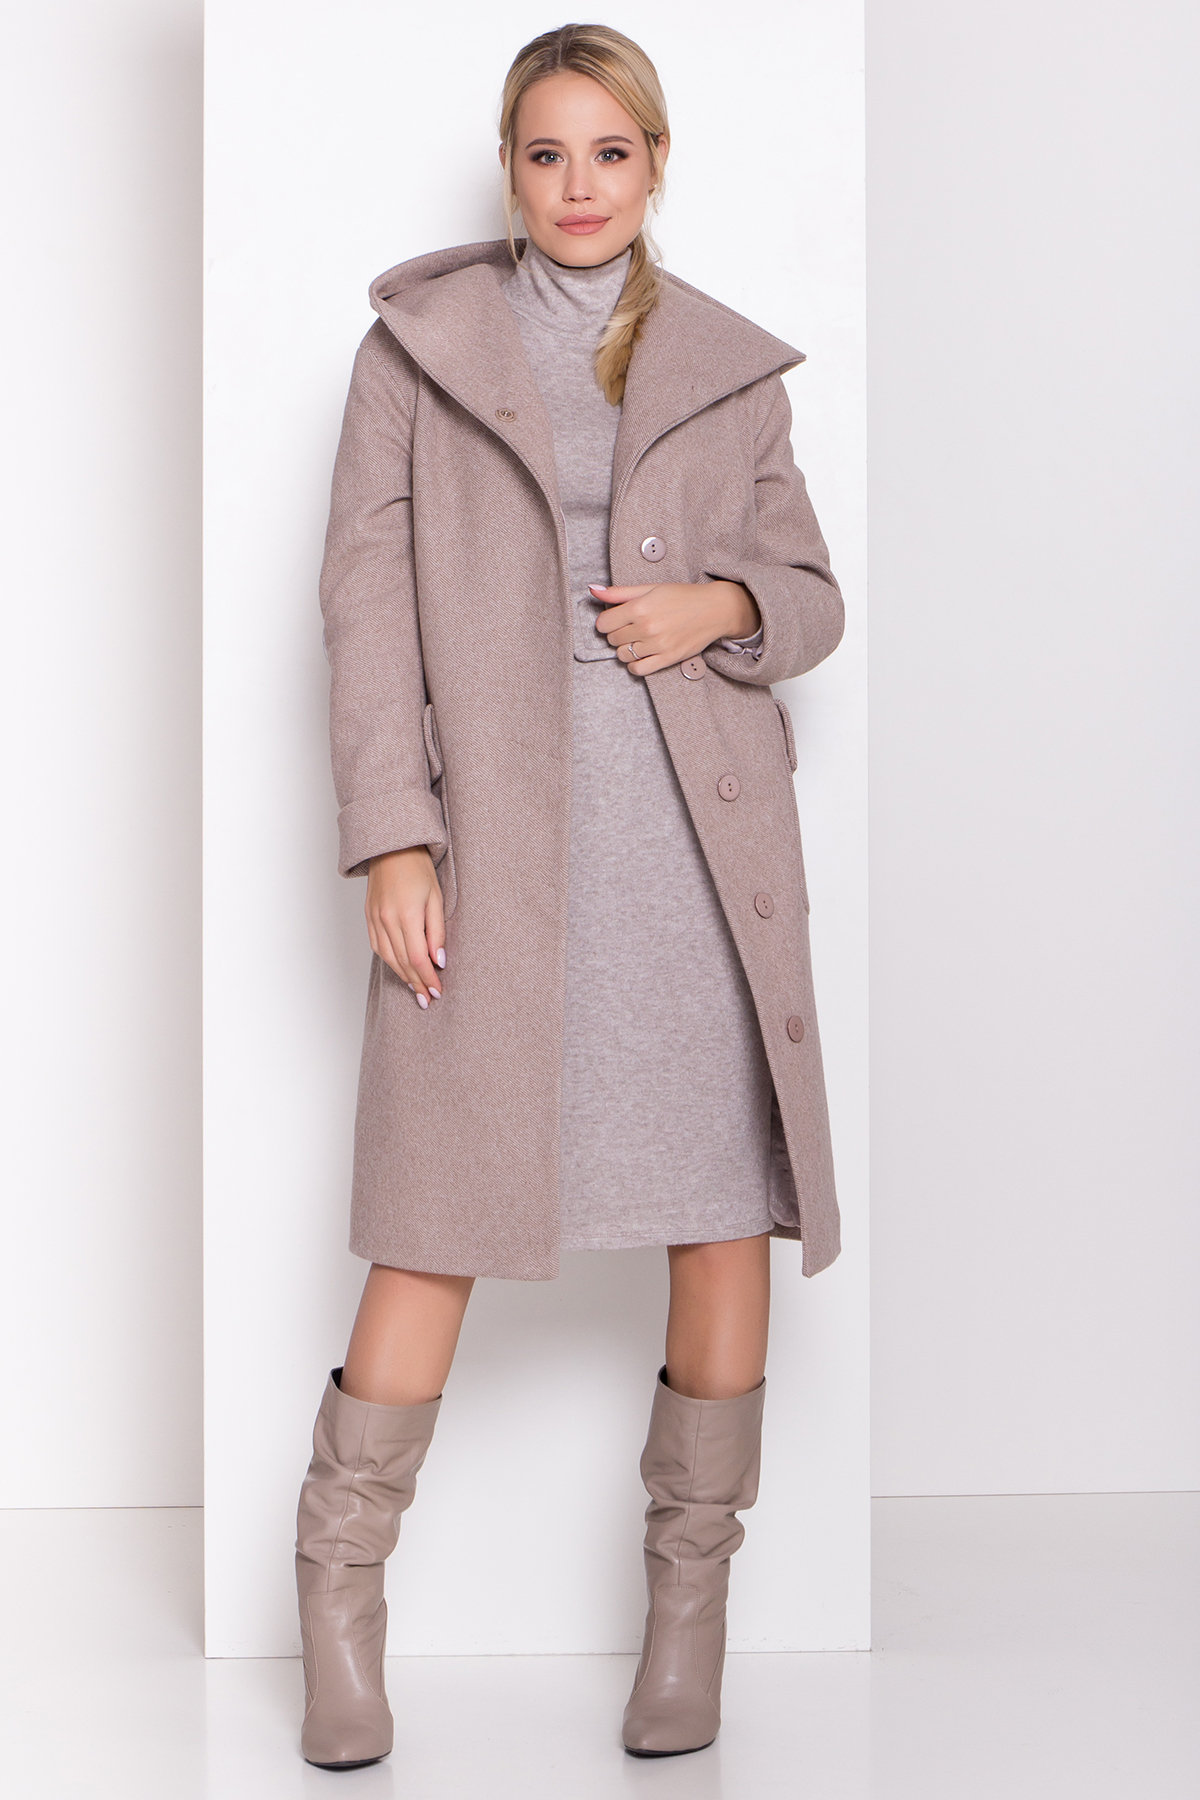 Пальто зима Анджи 8455 АРТ. 44727 Цвет: Бежевый меланж - фото 2, интернет магазин tm-modus.ru